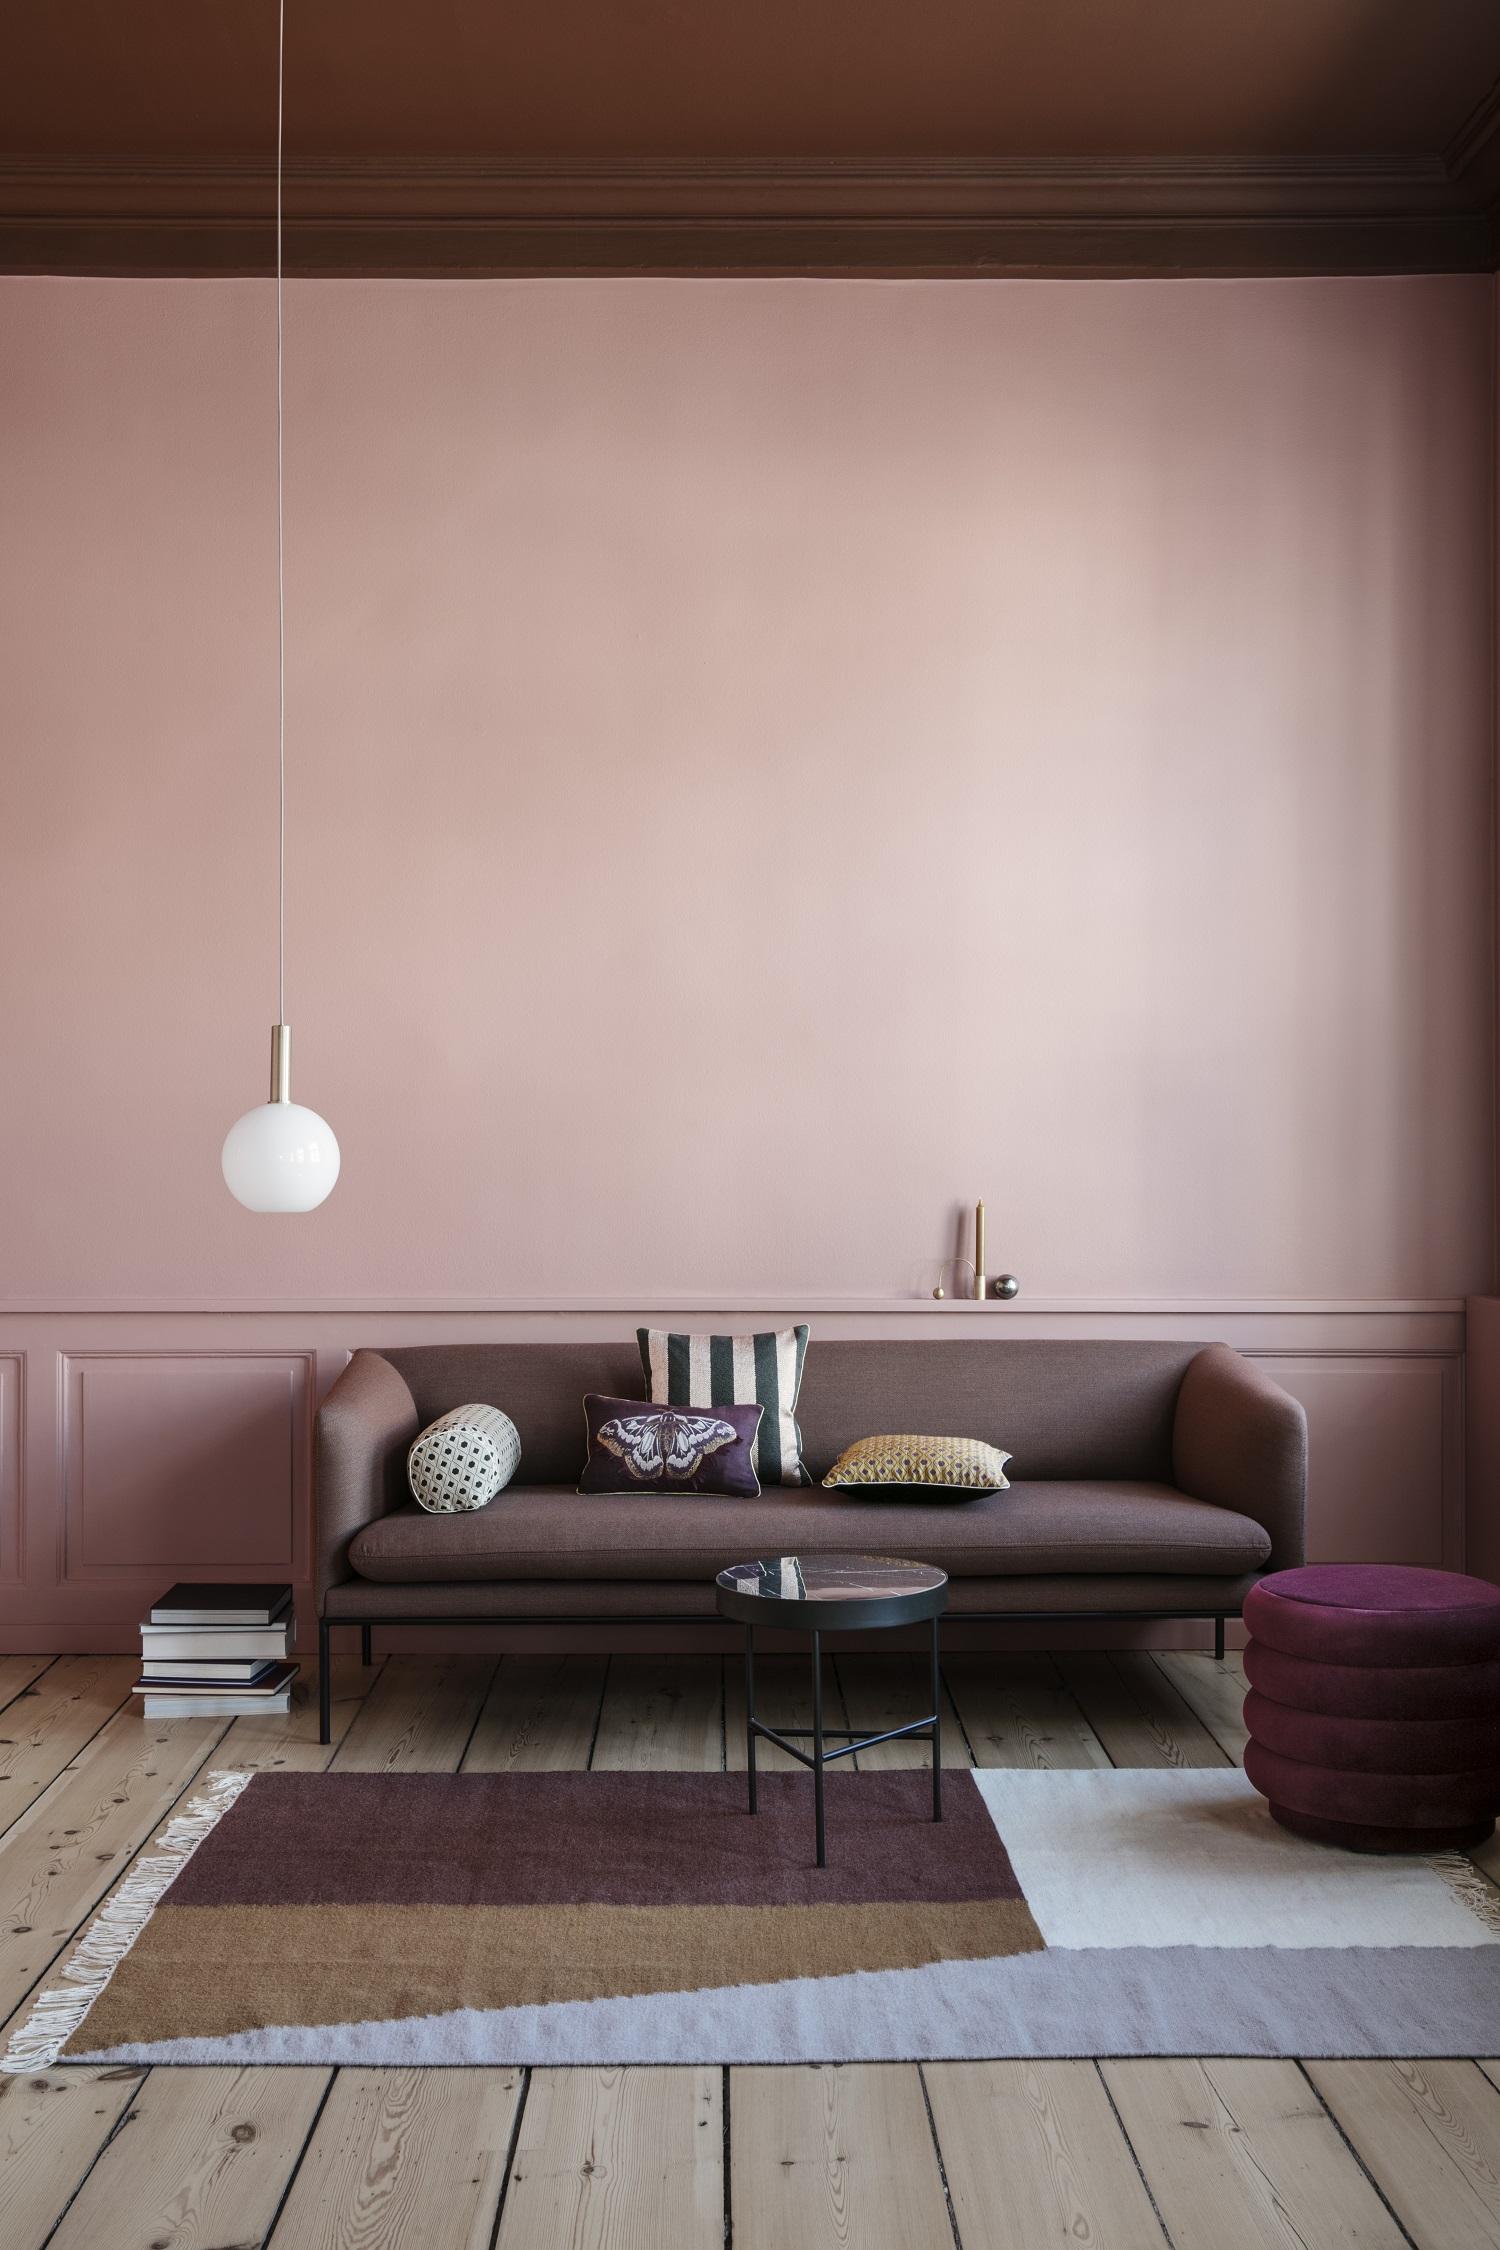 interiorlicious-kleur-plafond-ferm-living